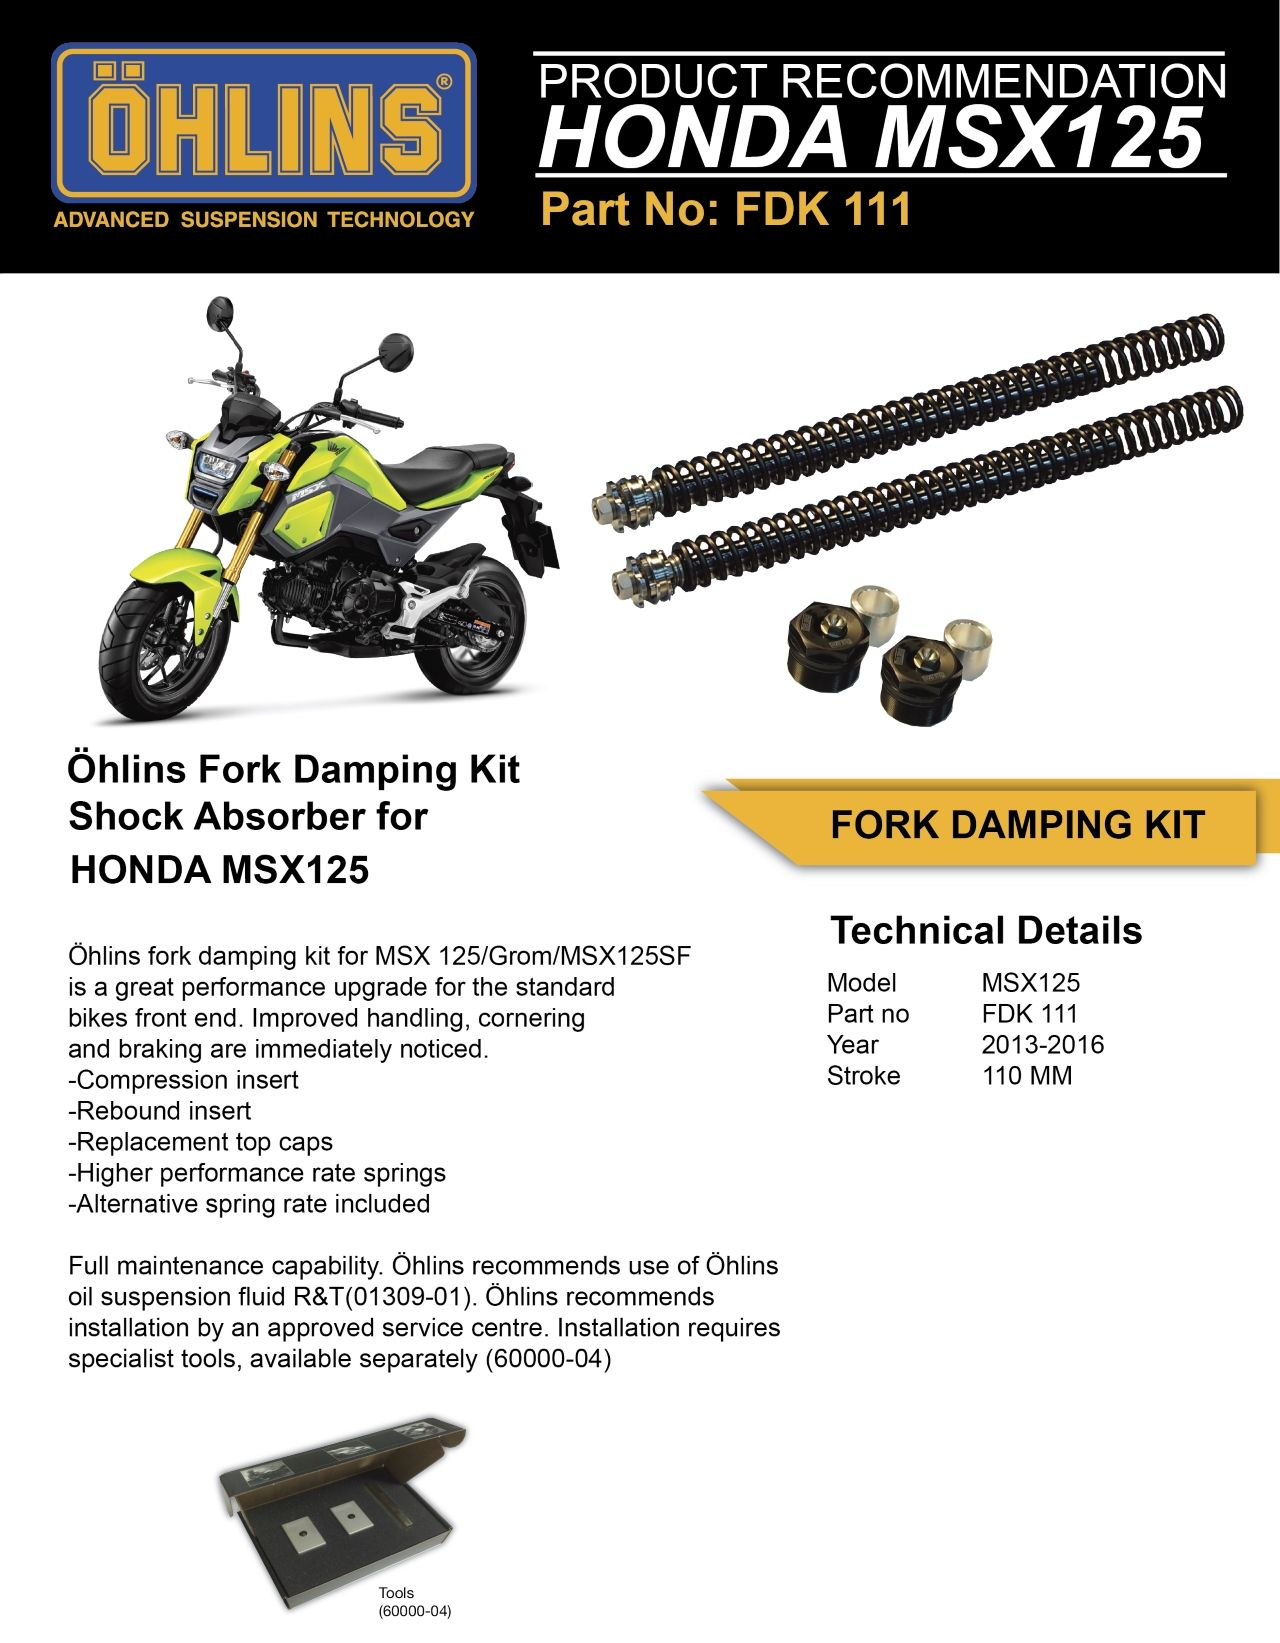 OHLINS : Dämpfer Set Stoßdämpfer für HONDA MSX 125 [FDK111]